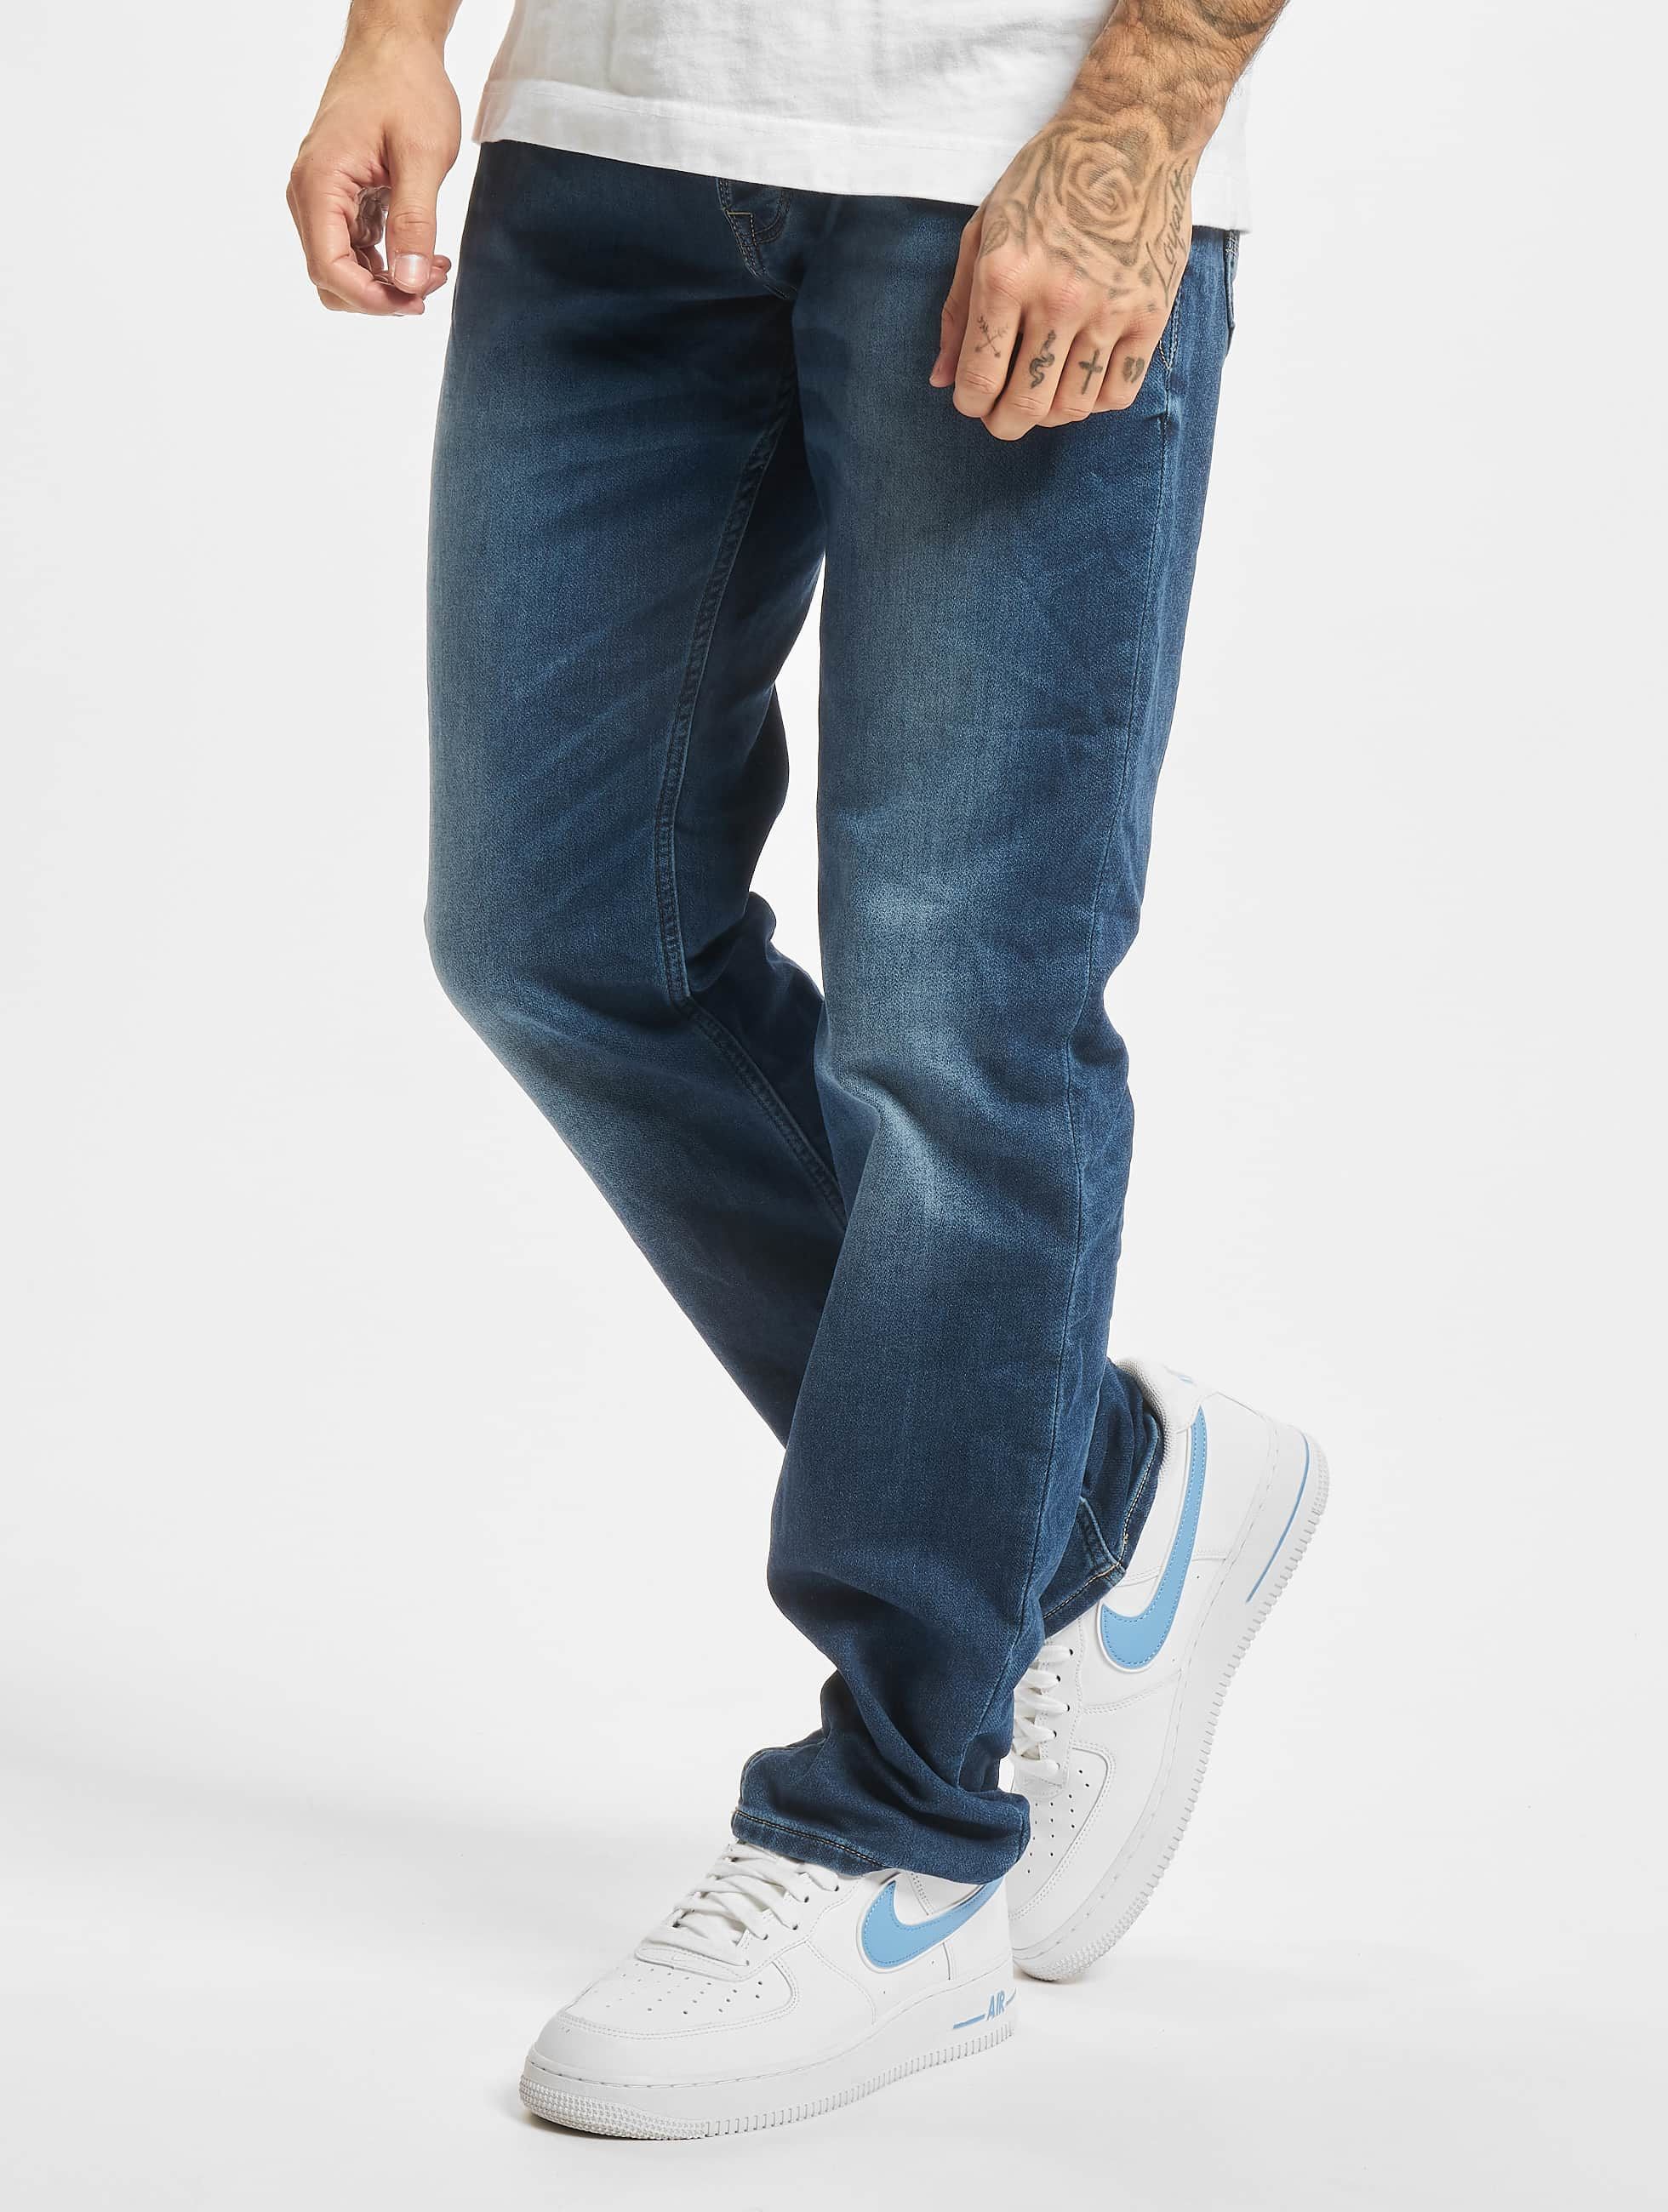 Jack & Jones Männer Loose Fit Jeans jjTim jjLeon GE 382 in blau